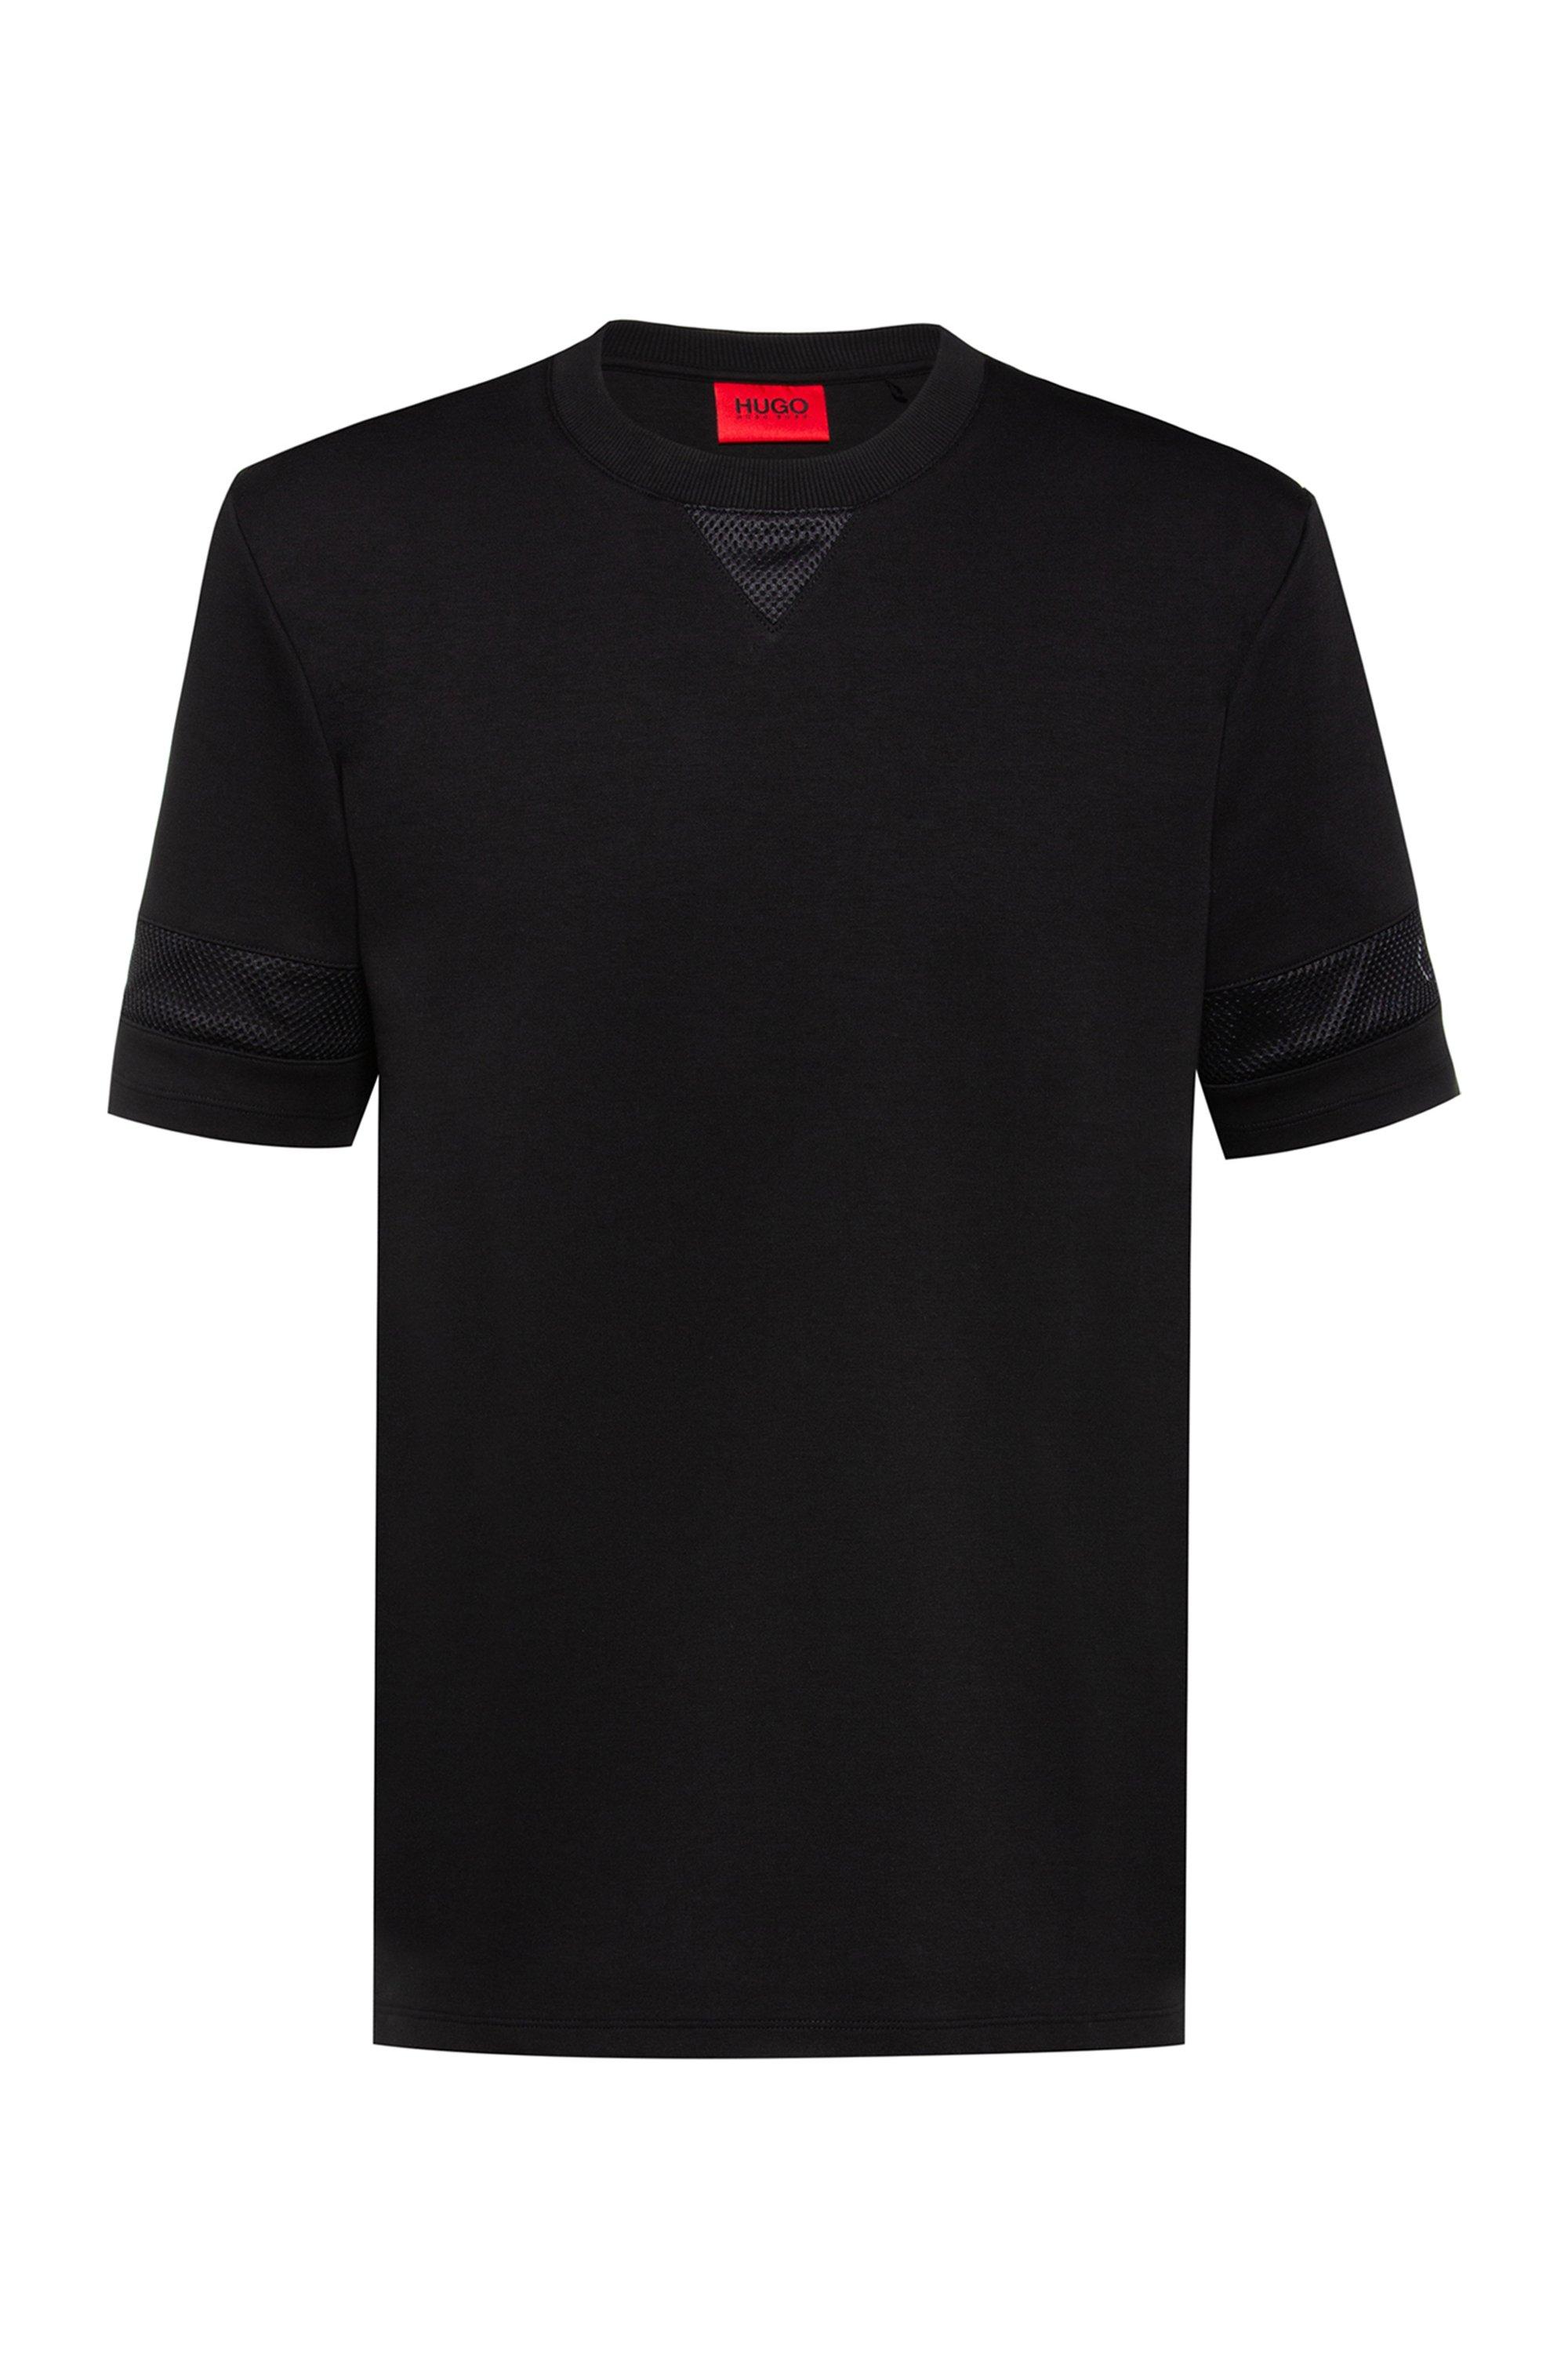 T-shirt Relaxed Fit avec empiècements en mesh et logos, Noir